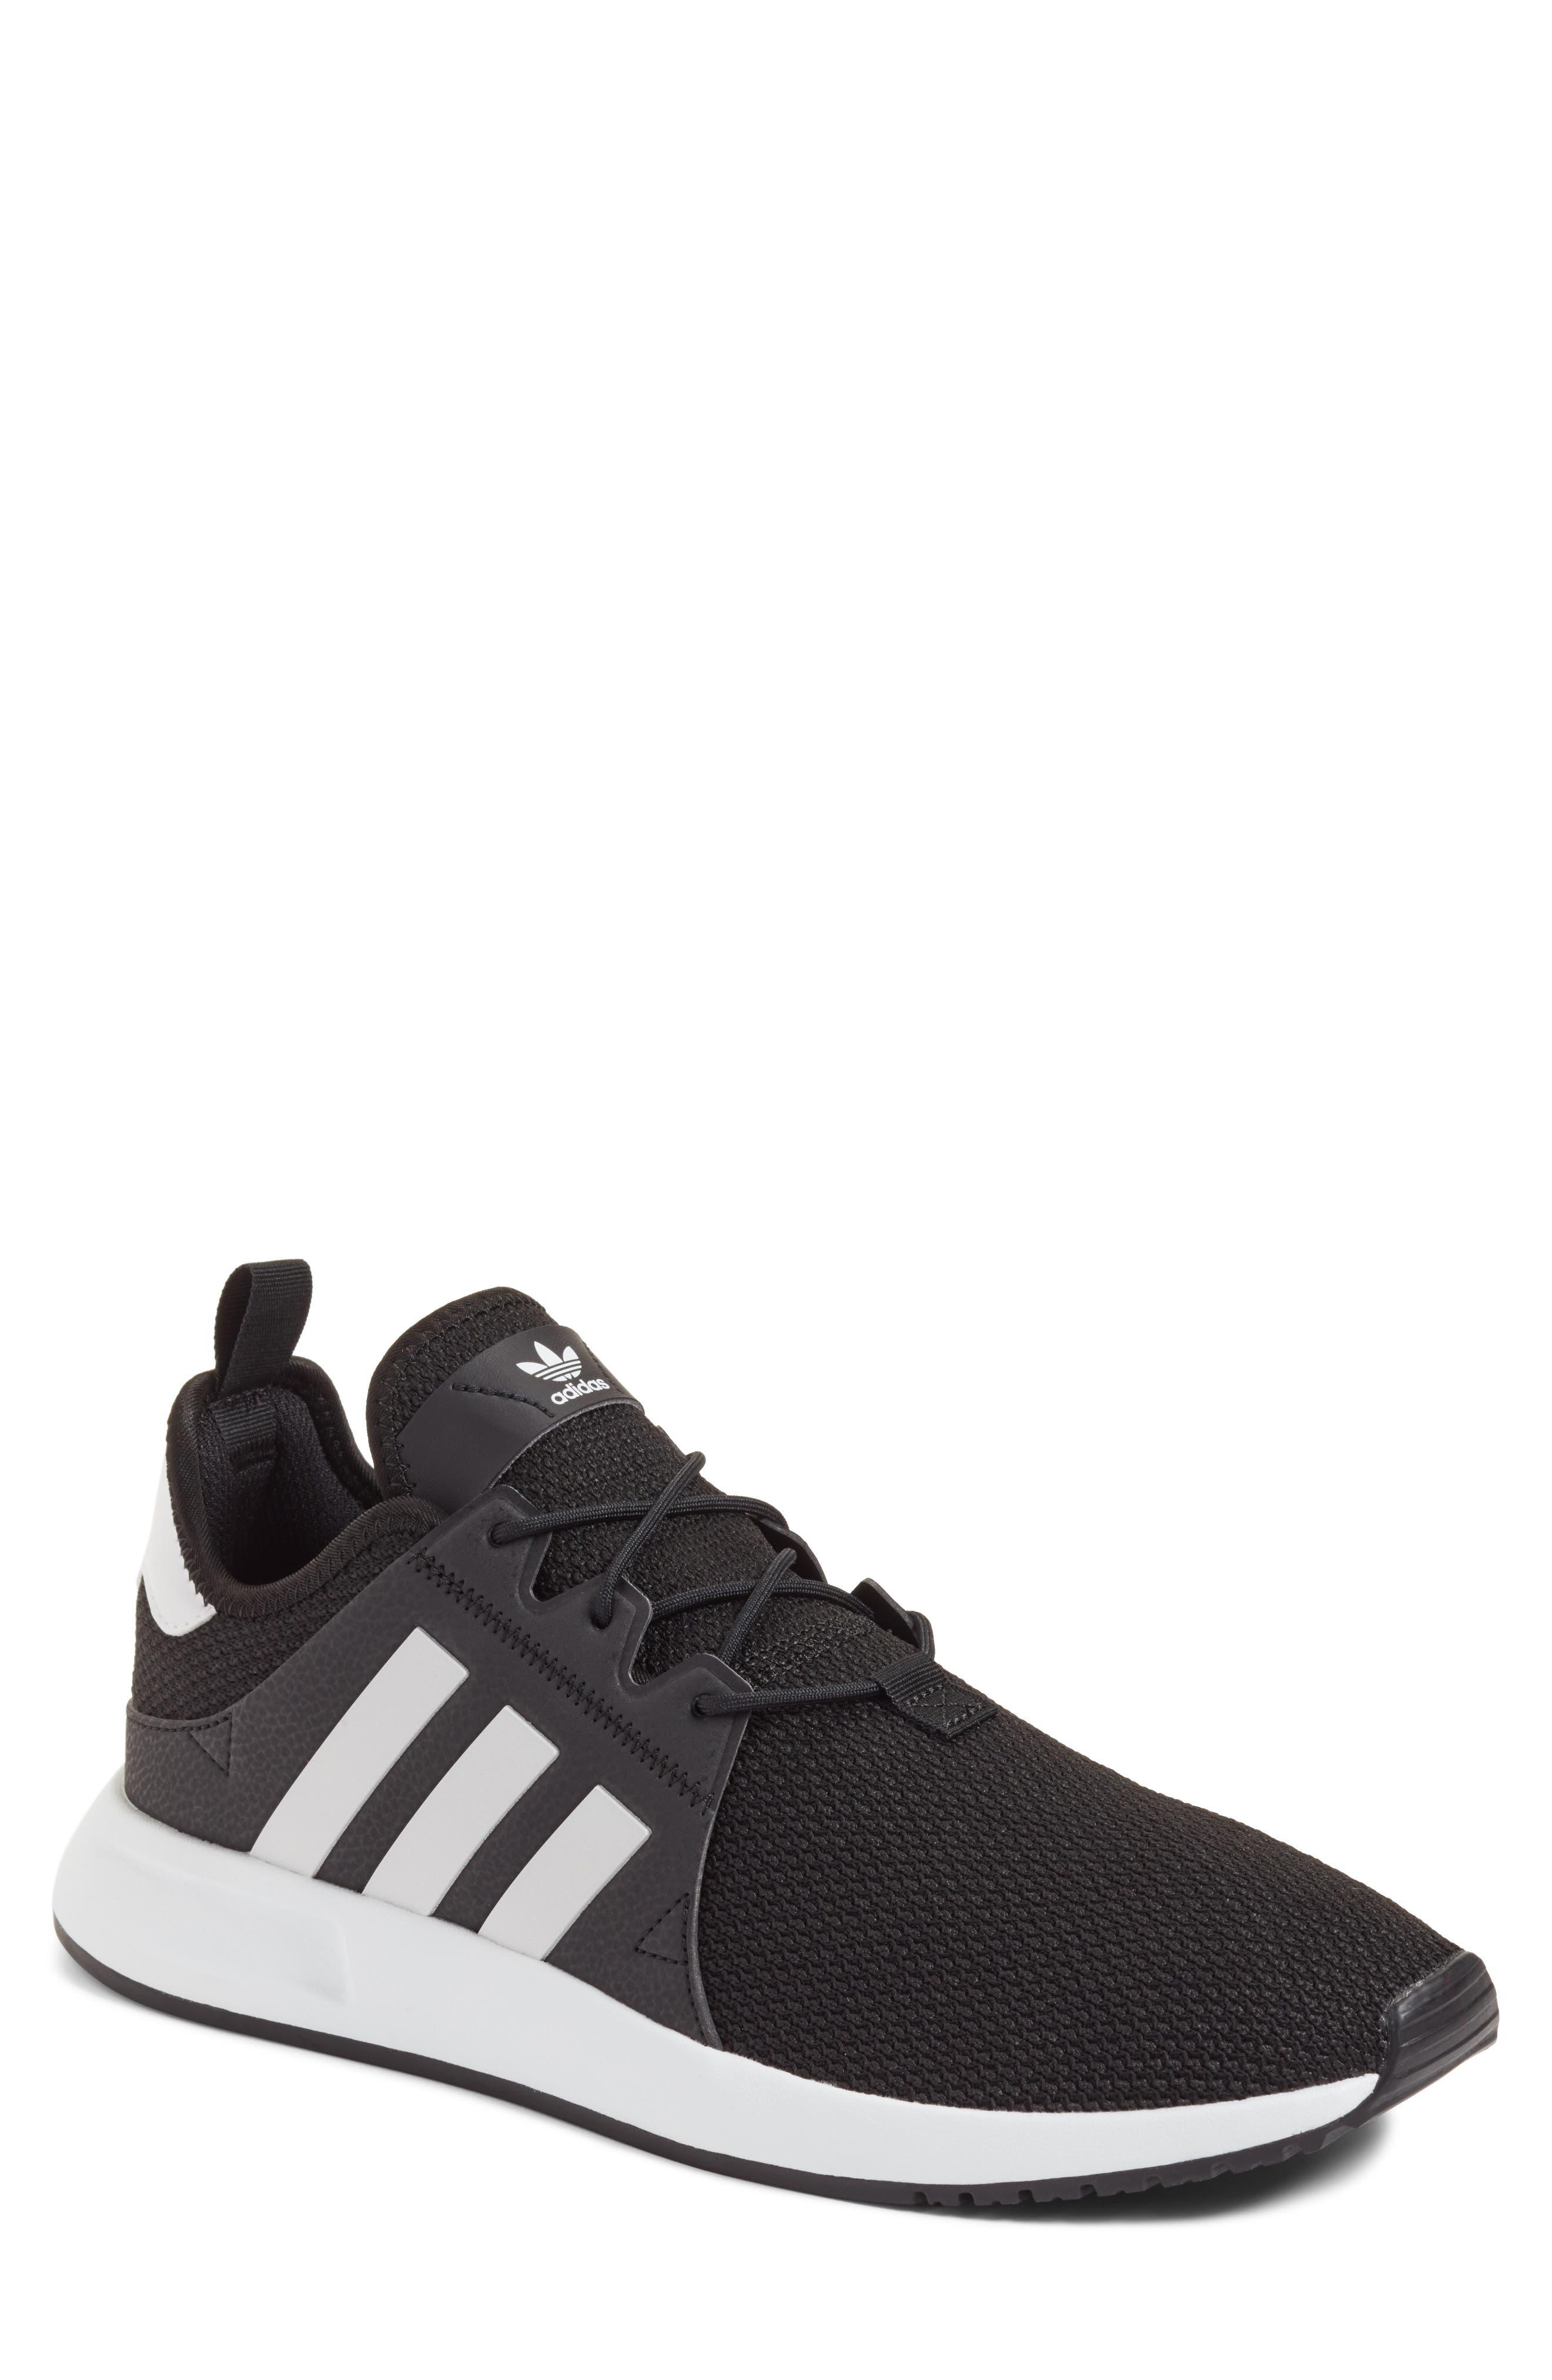 X_PLR Sneaker,                         Main,                         color, BLACK/ WHITE/ BLACK